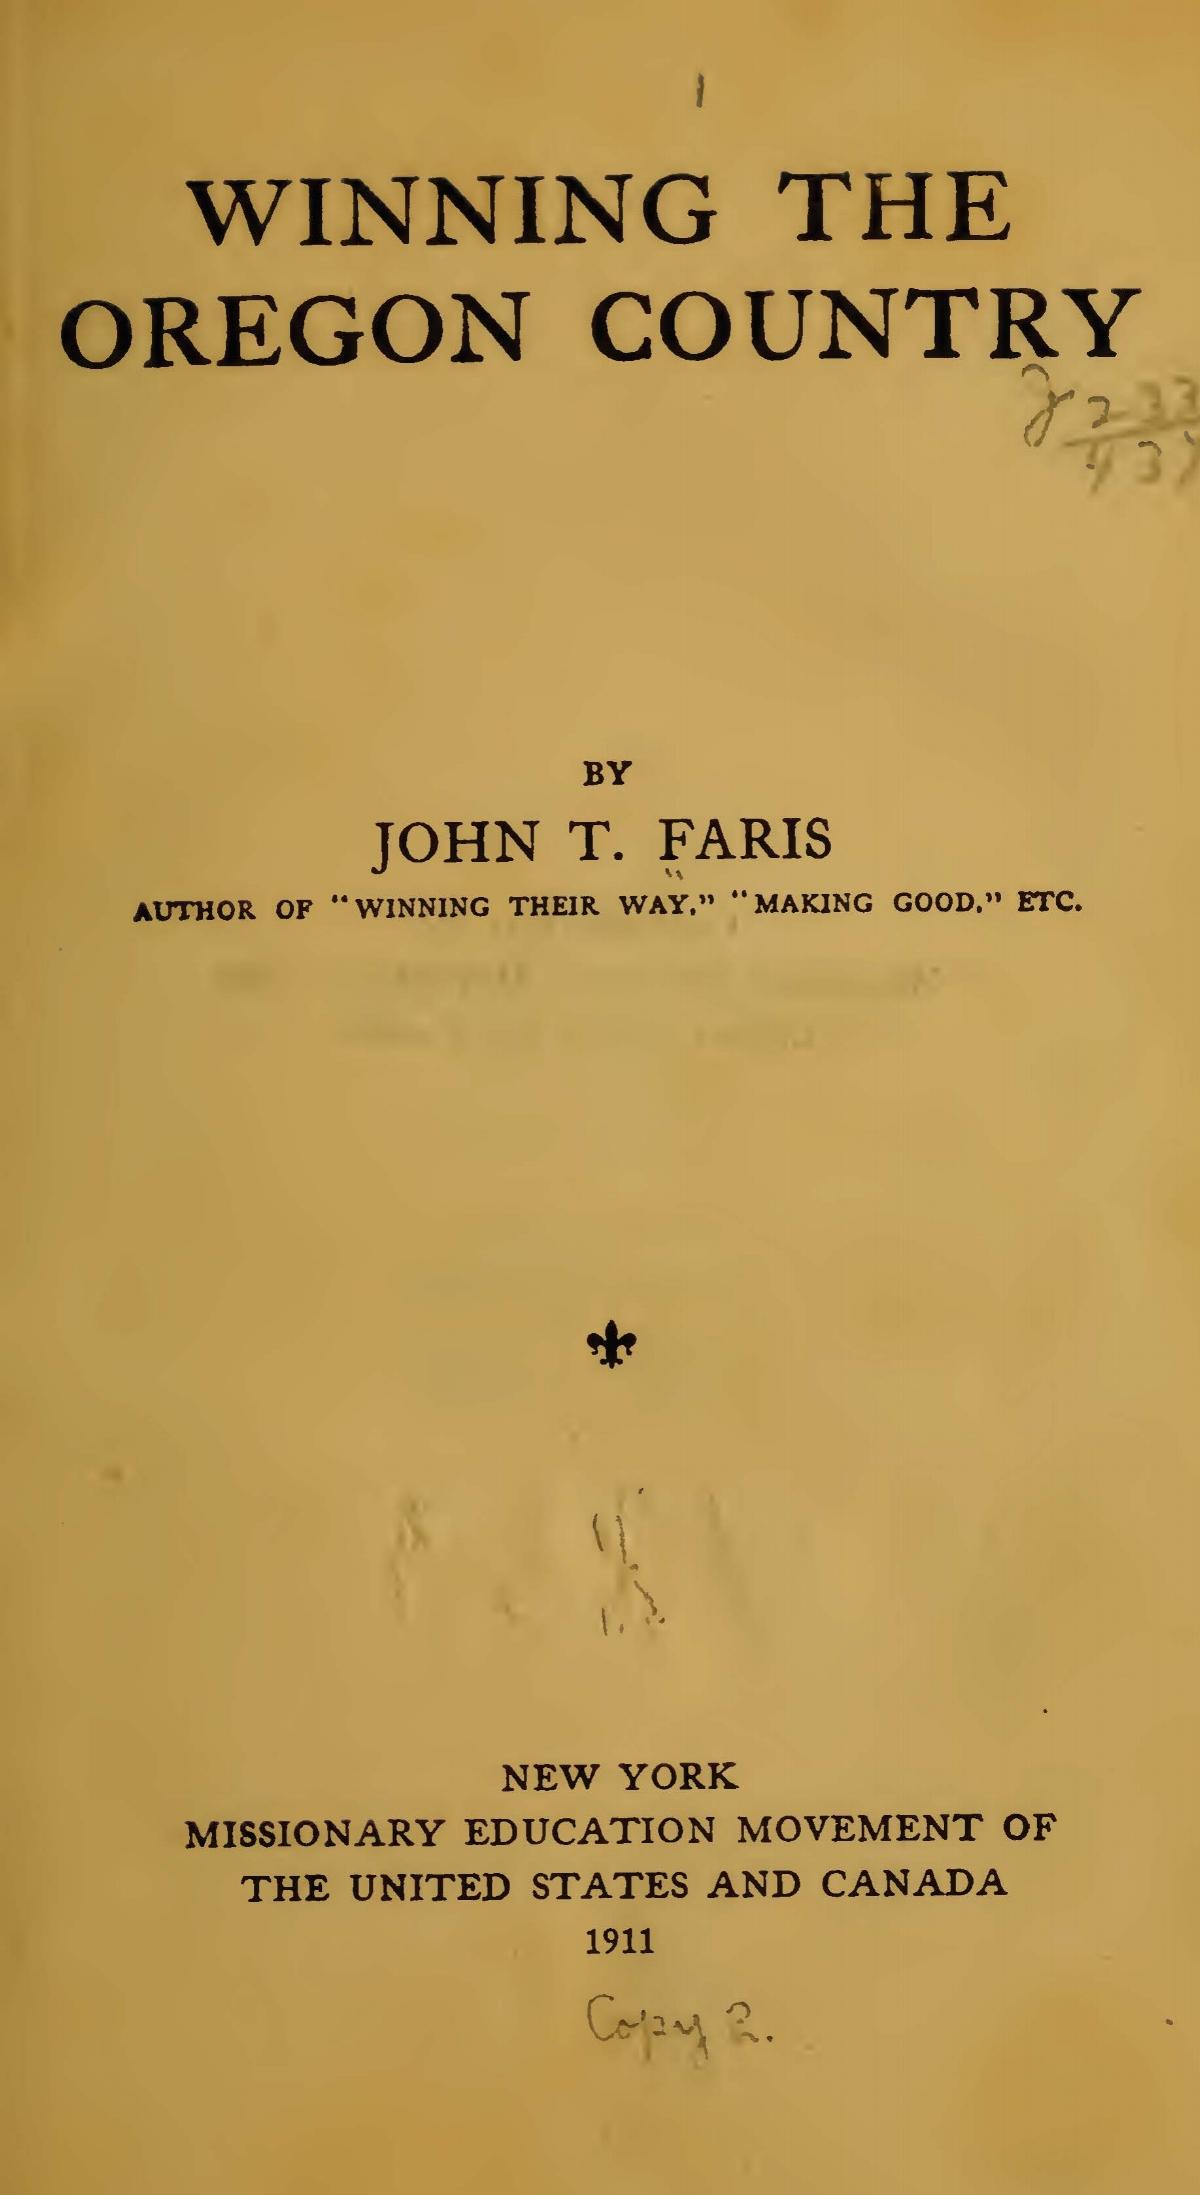 Faris, John Thomson, Winning the Oregon Country Title Page.jpg